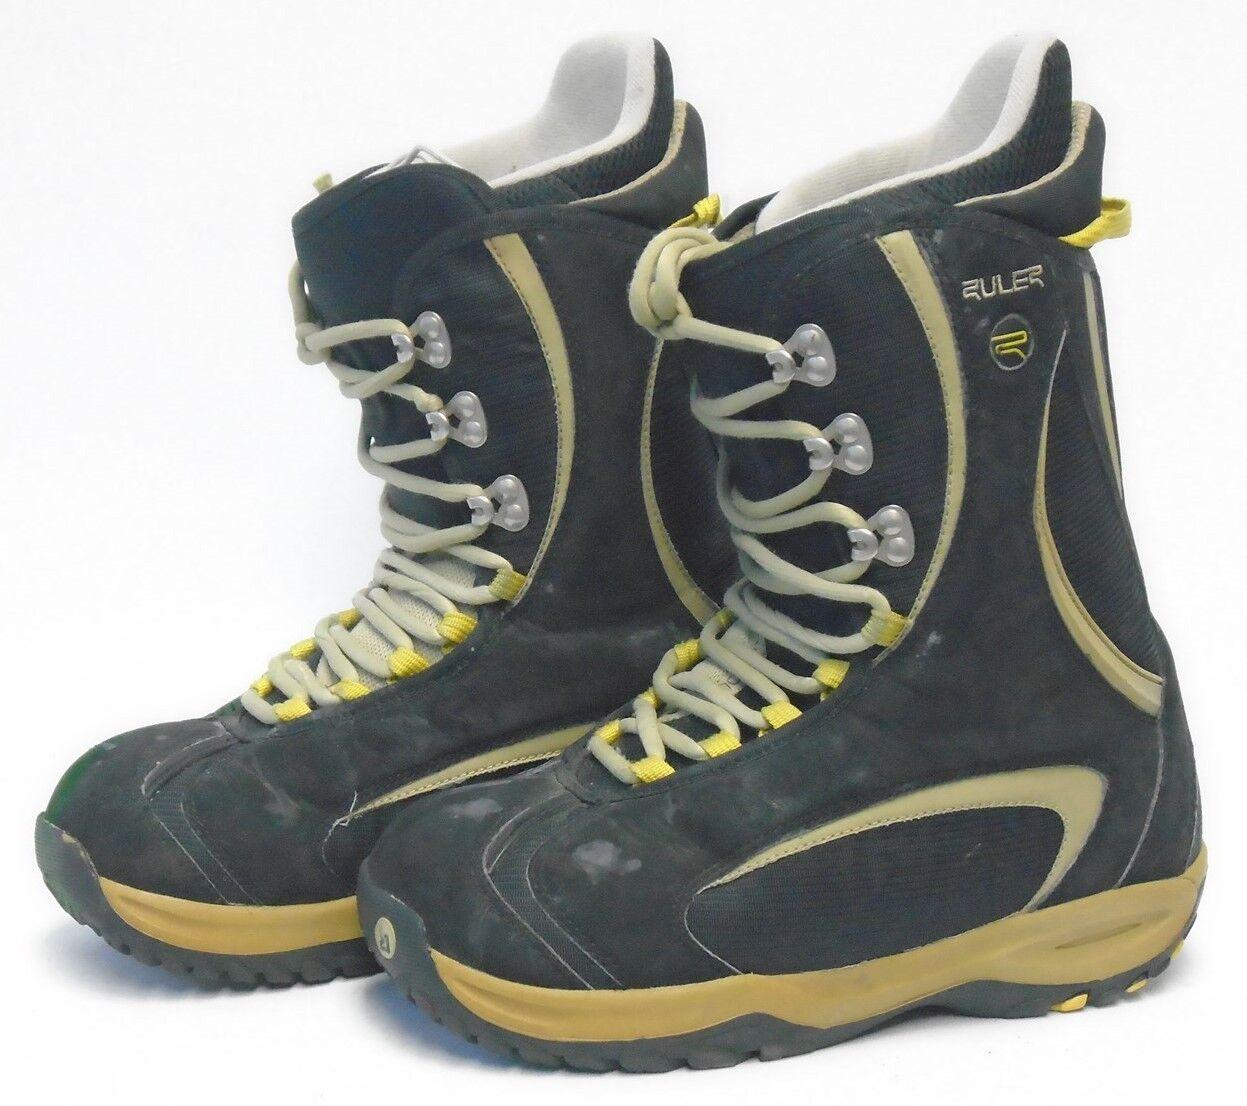 Burton Ruler Snowboard Boots - Size 8.5 Used